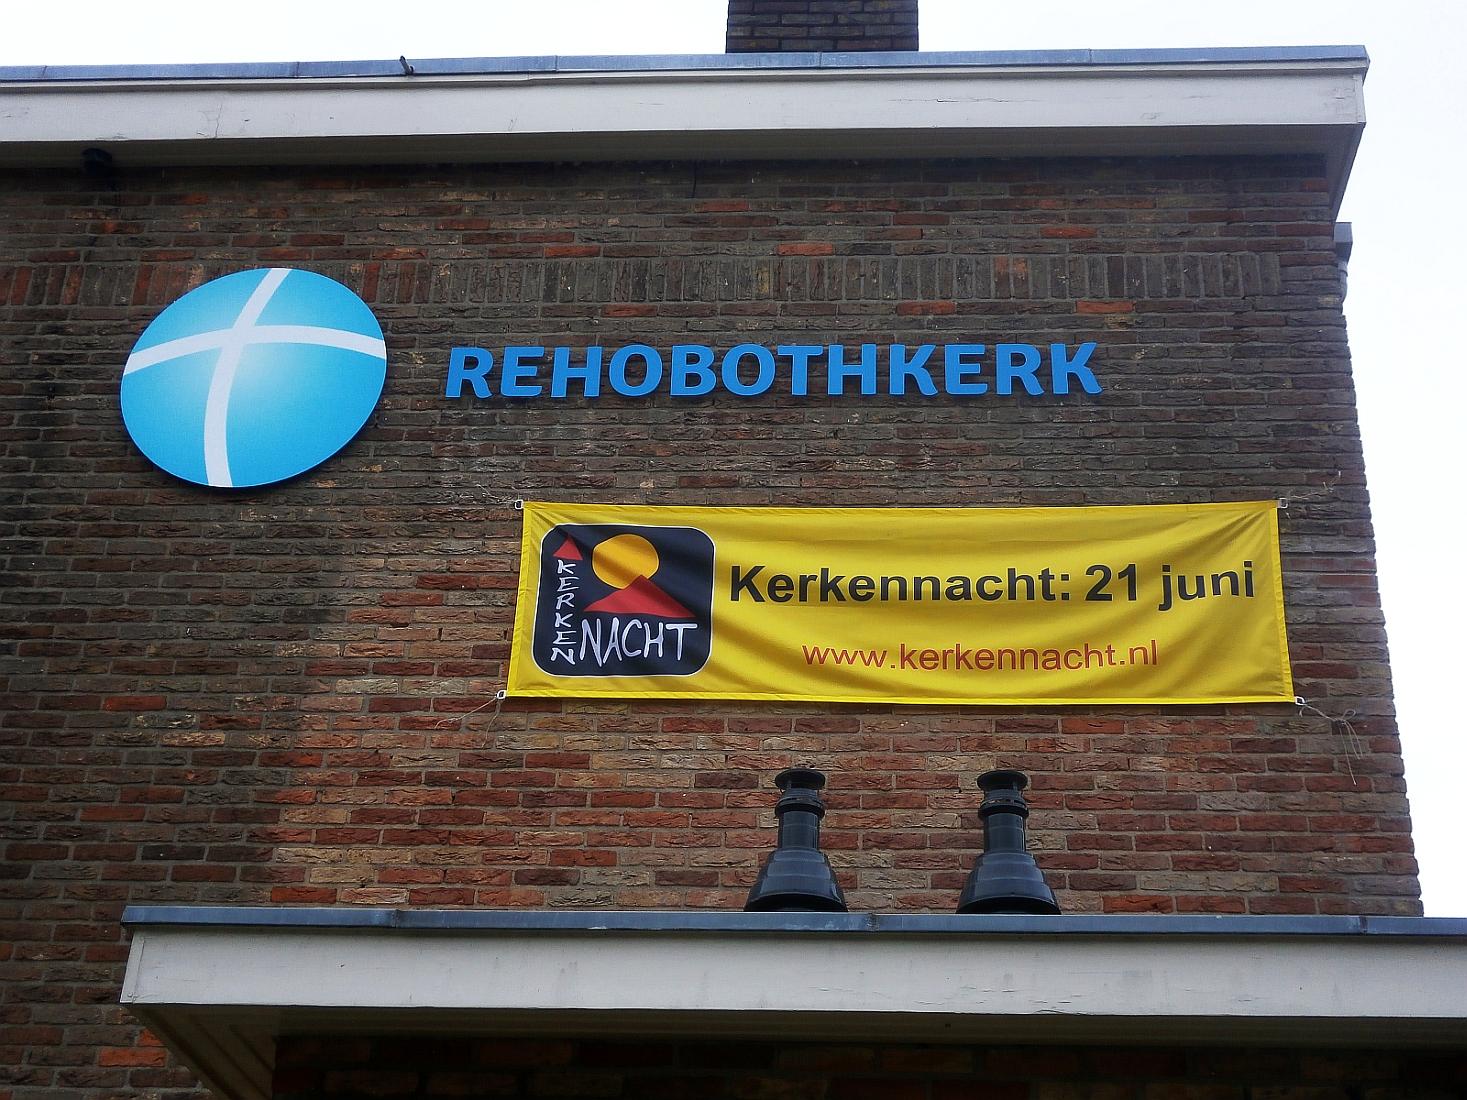 Rehobothkerk Kerkennacht 2013 gevel